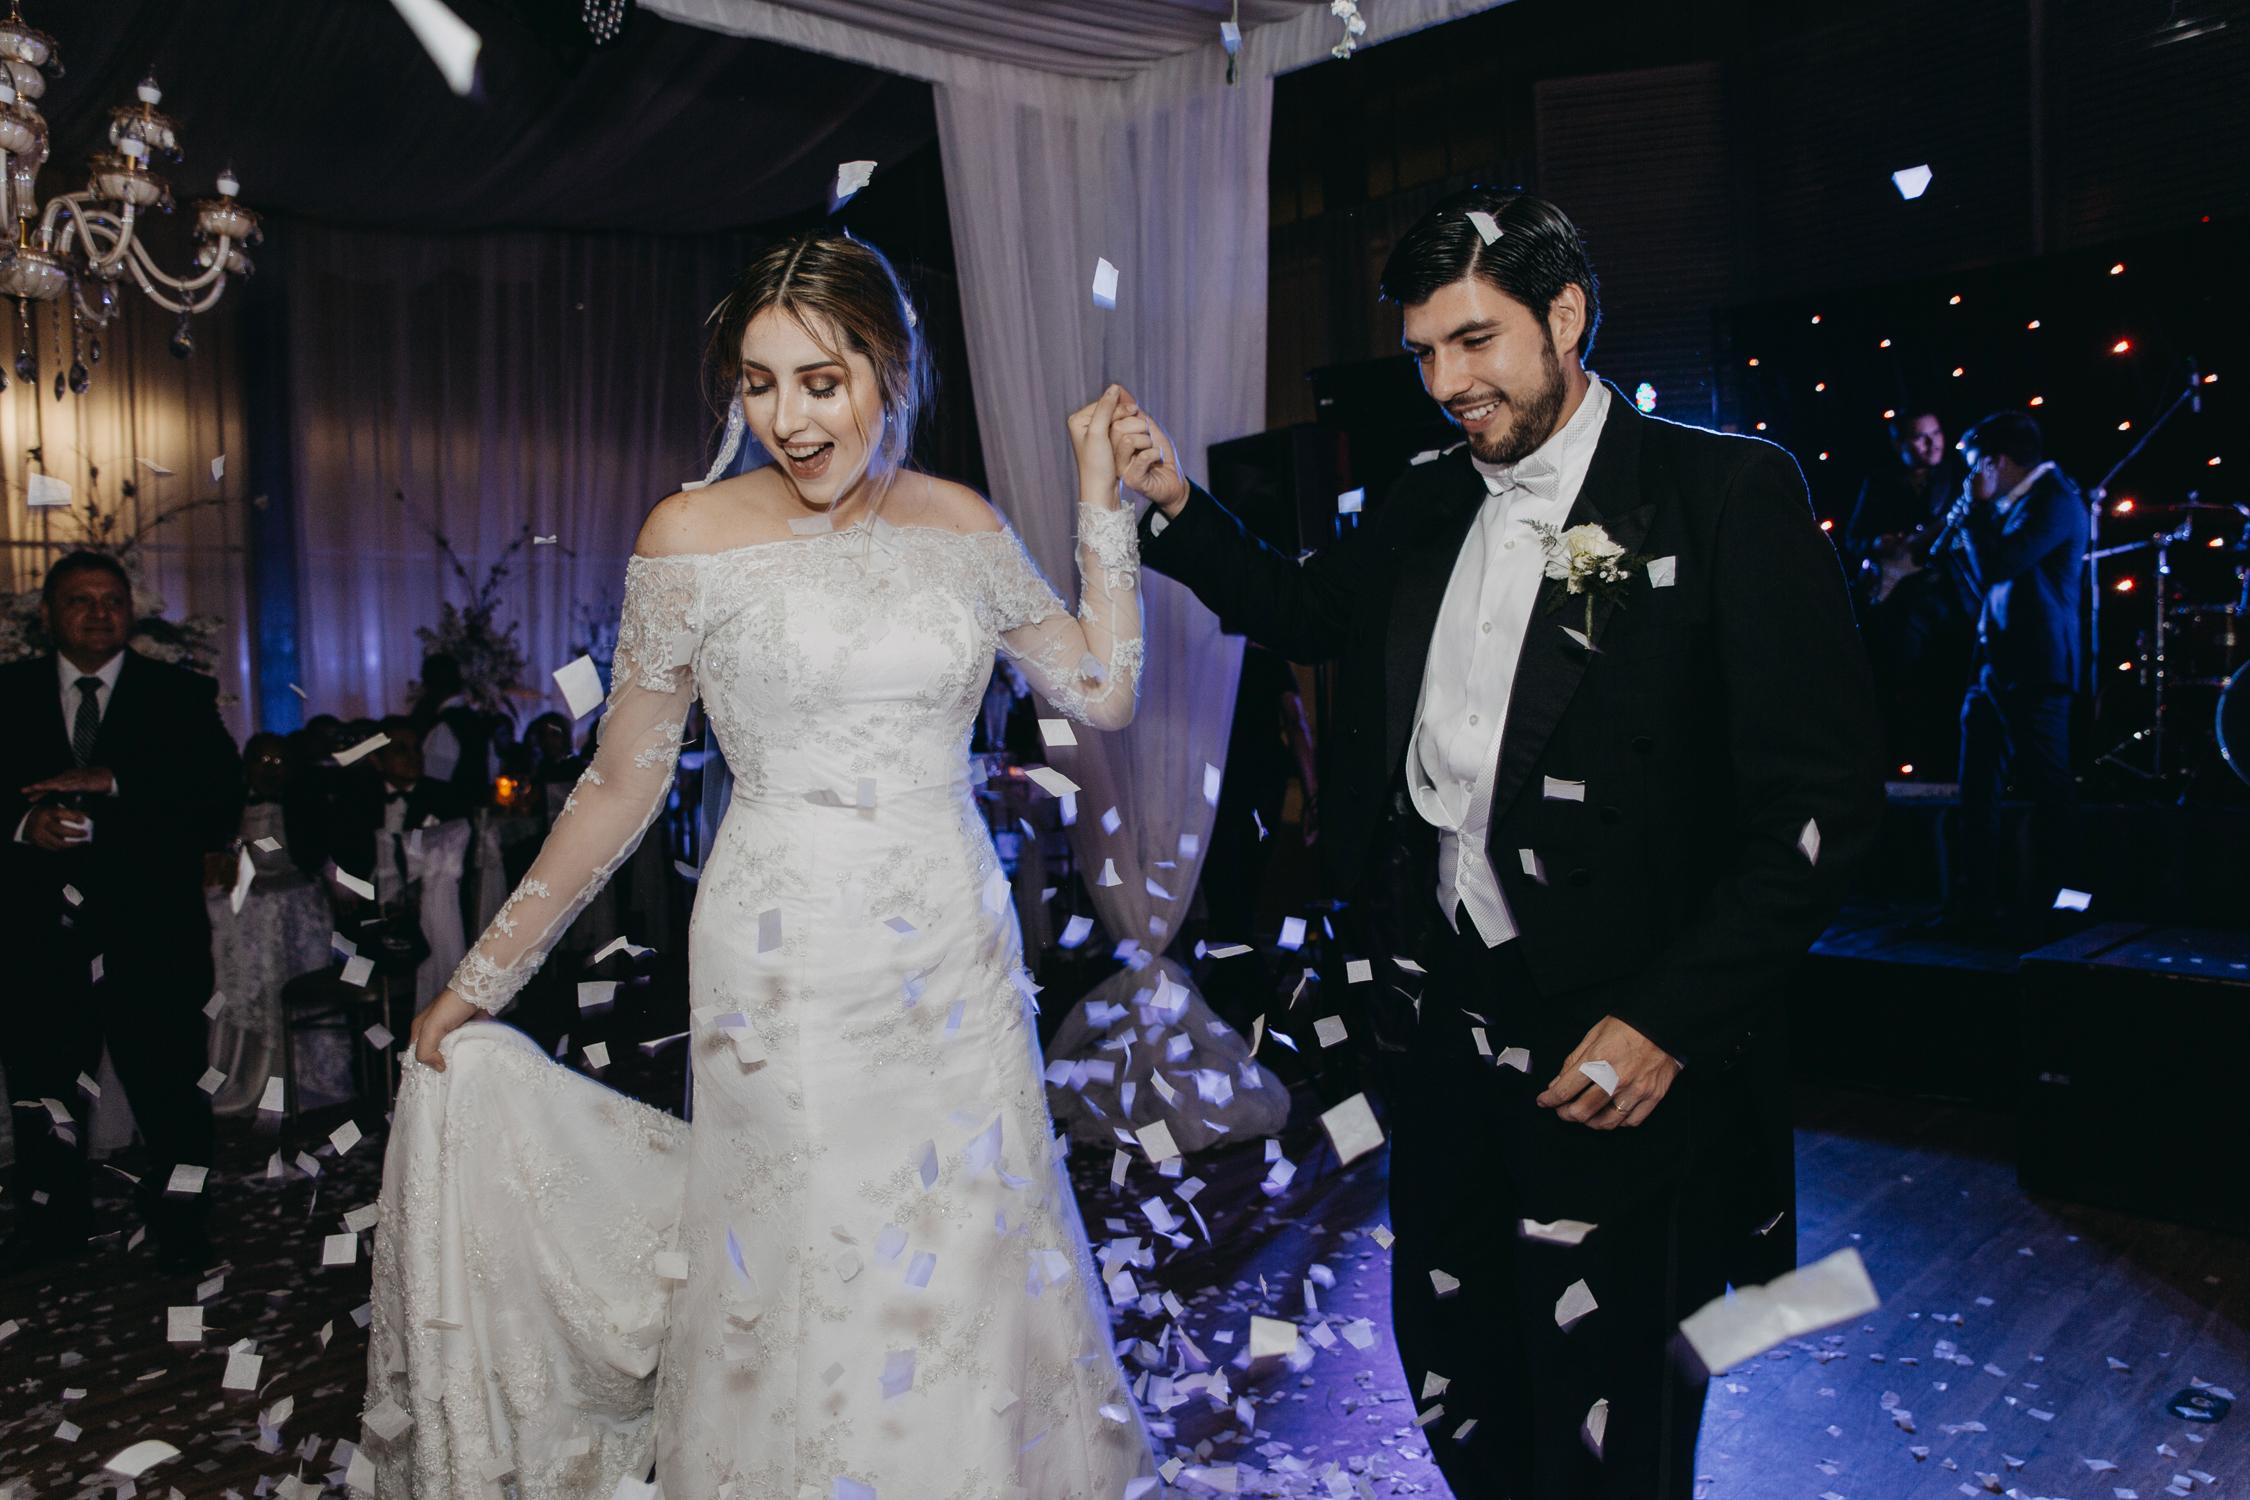 Michelle-Agurto-Fotografia-Bodas-Ecuador-Destination-Wedding-Photographer-Vicky-Javier-212.JPG